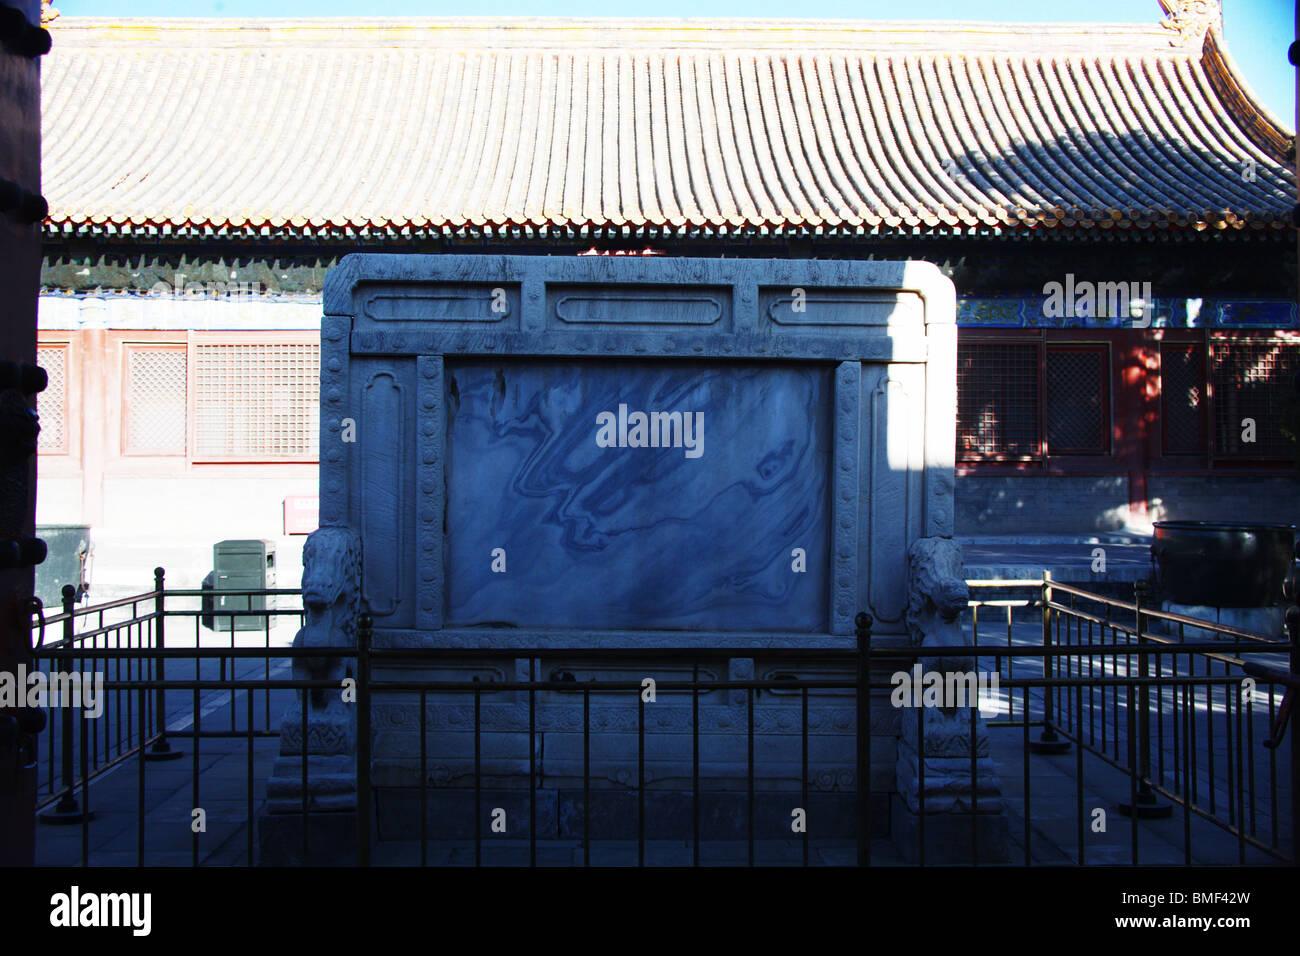 Marble Screen Stockfotos & Marble Screen Bilder - Alamy